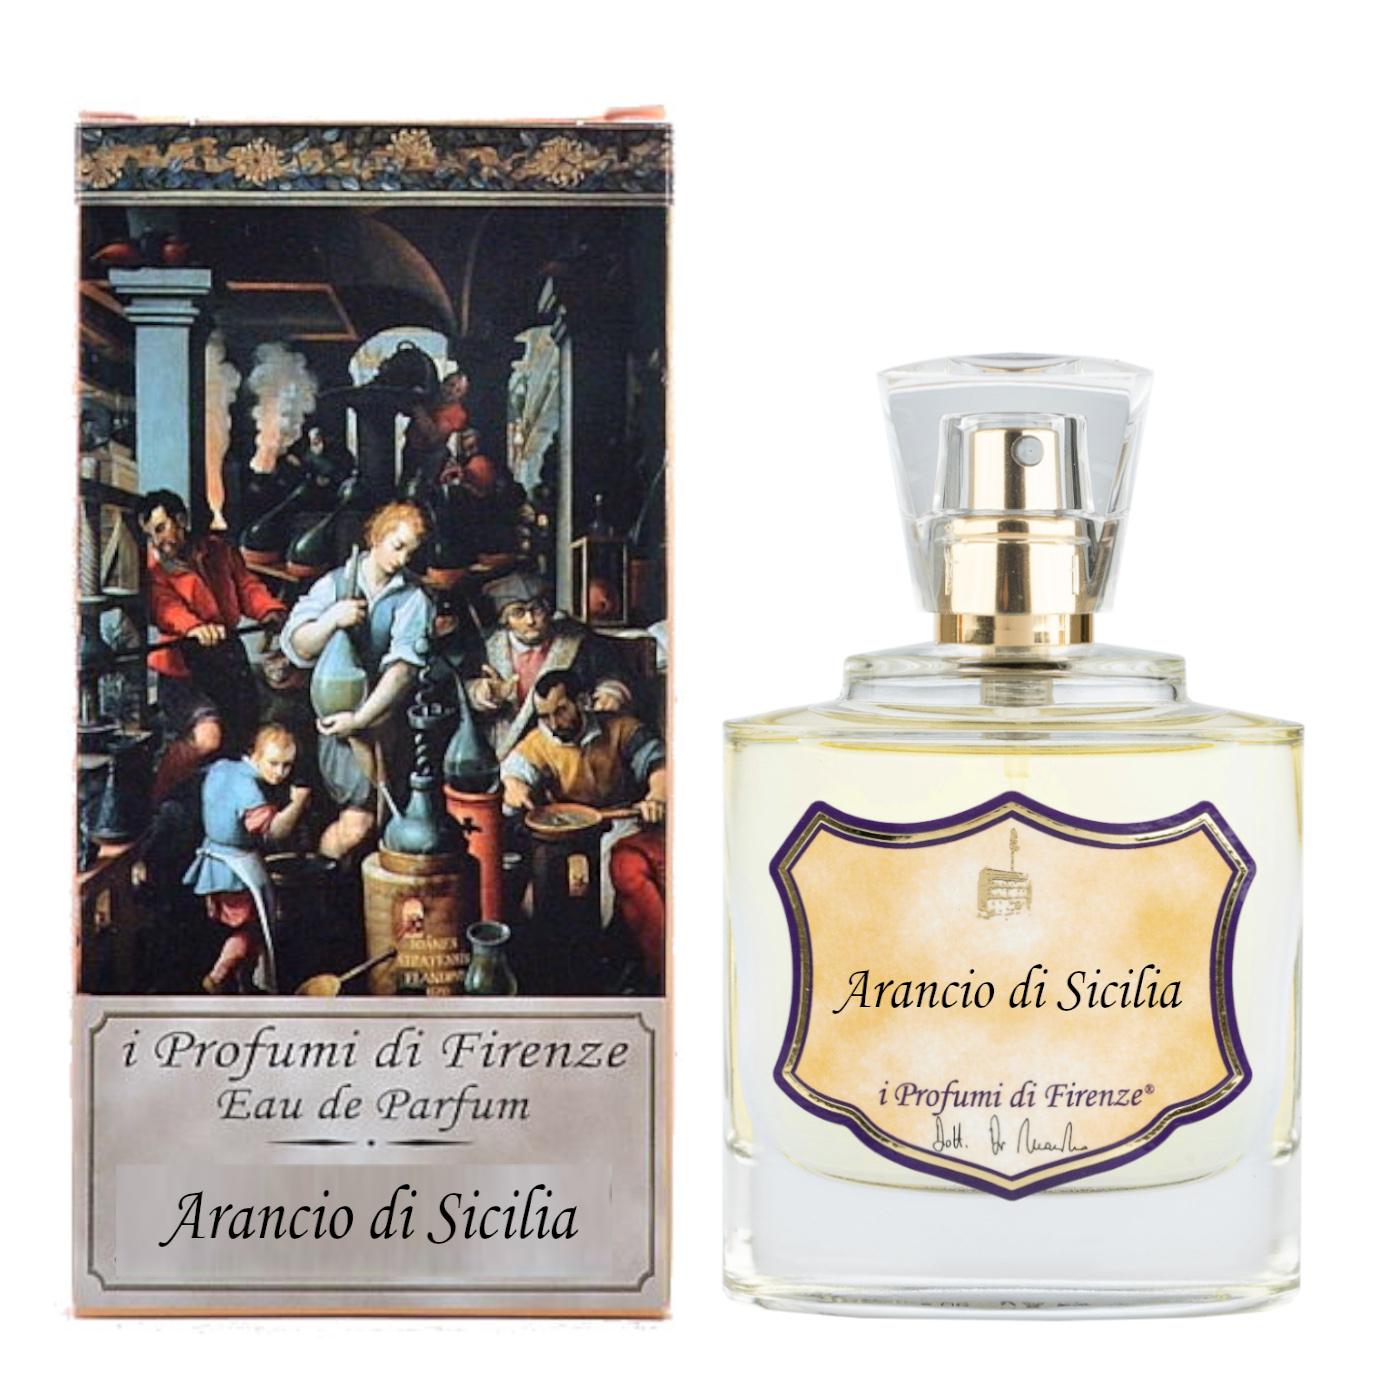 ARANCIO DI SICILIA - Eau de Parfum-4028